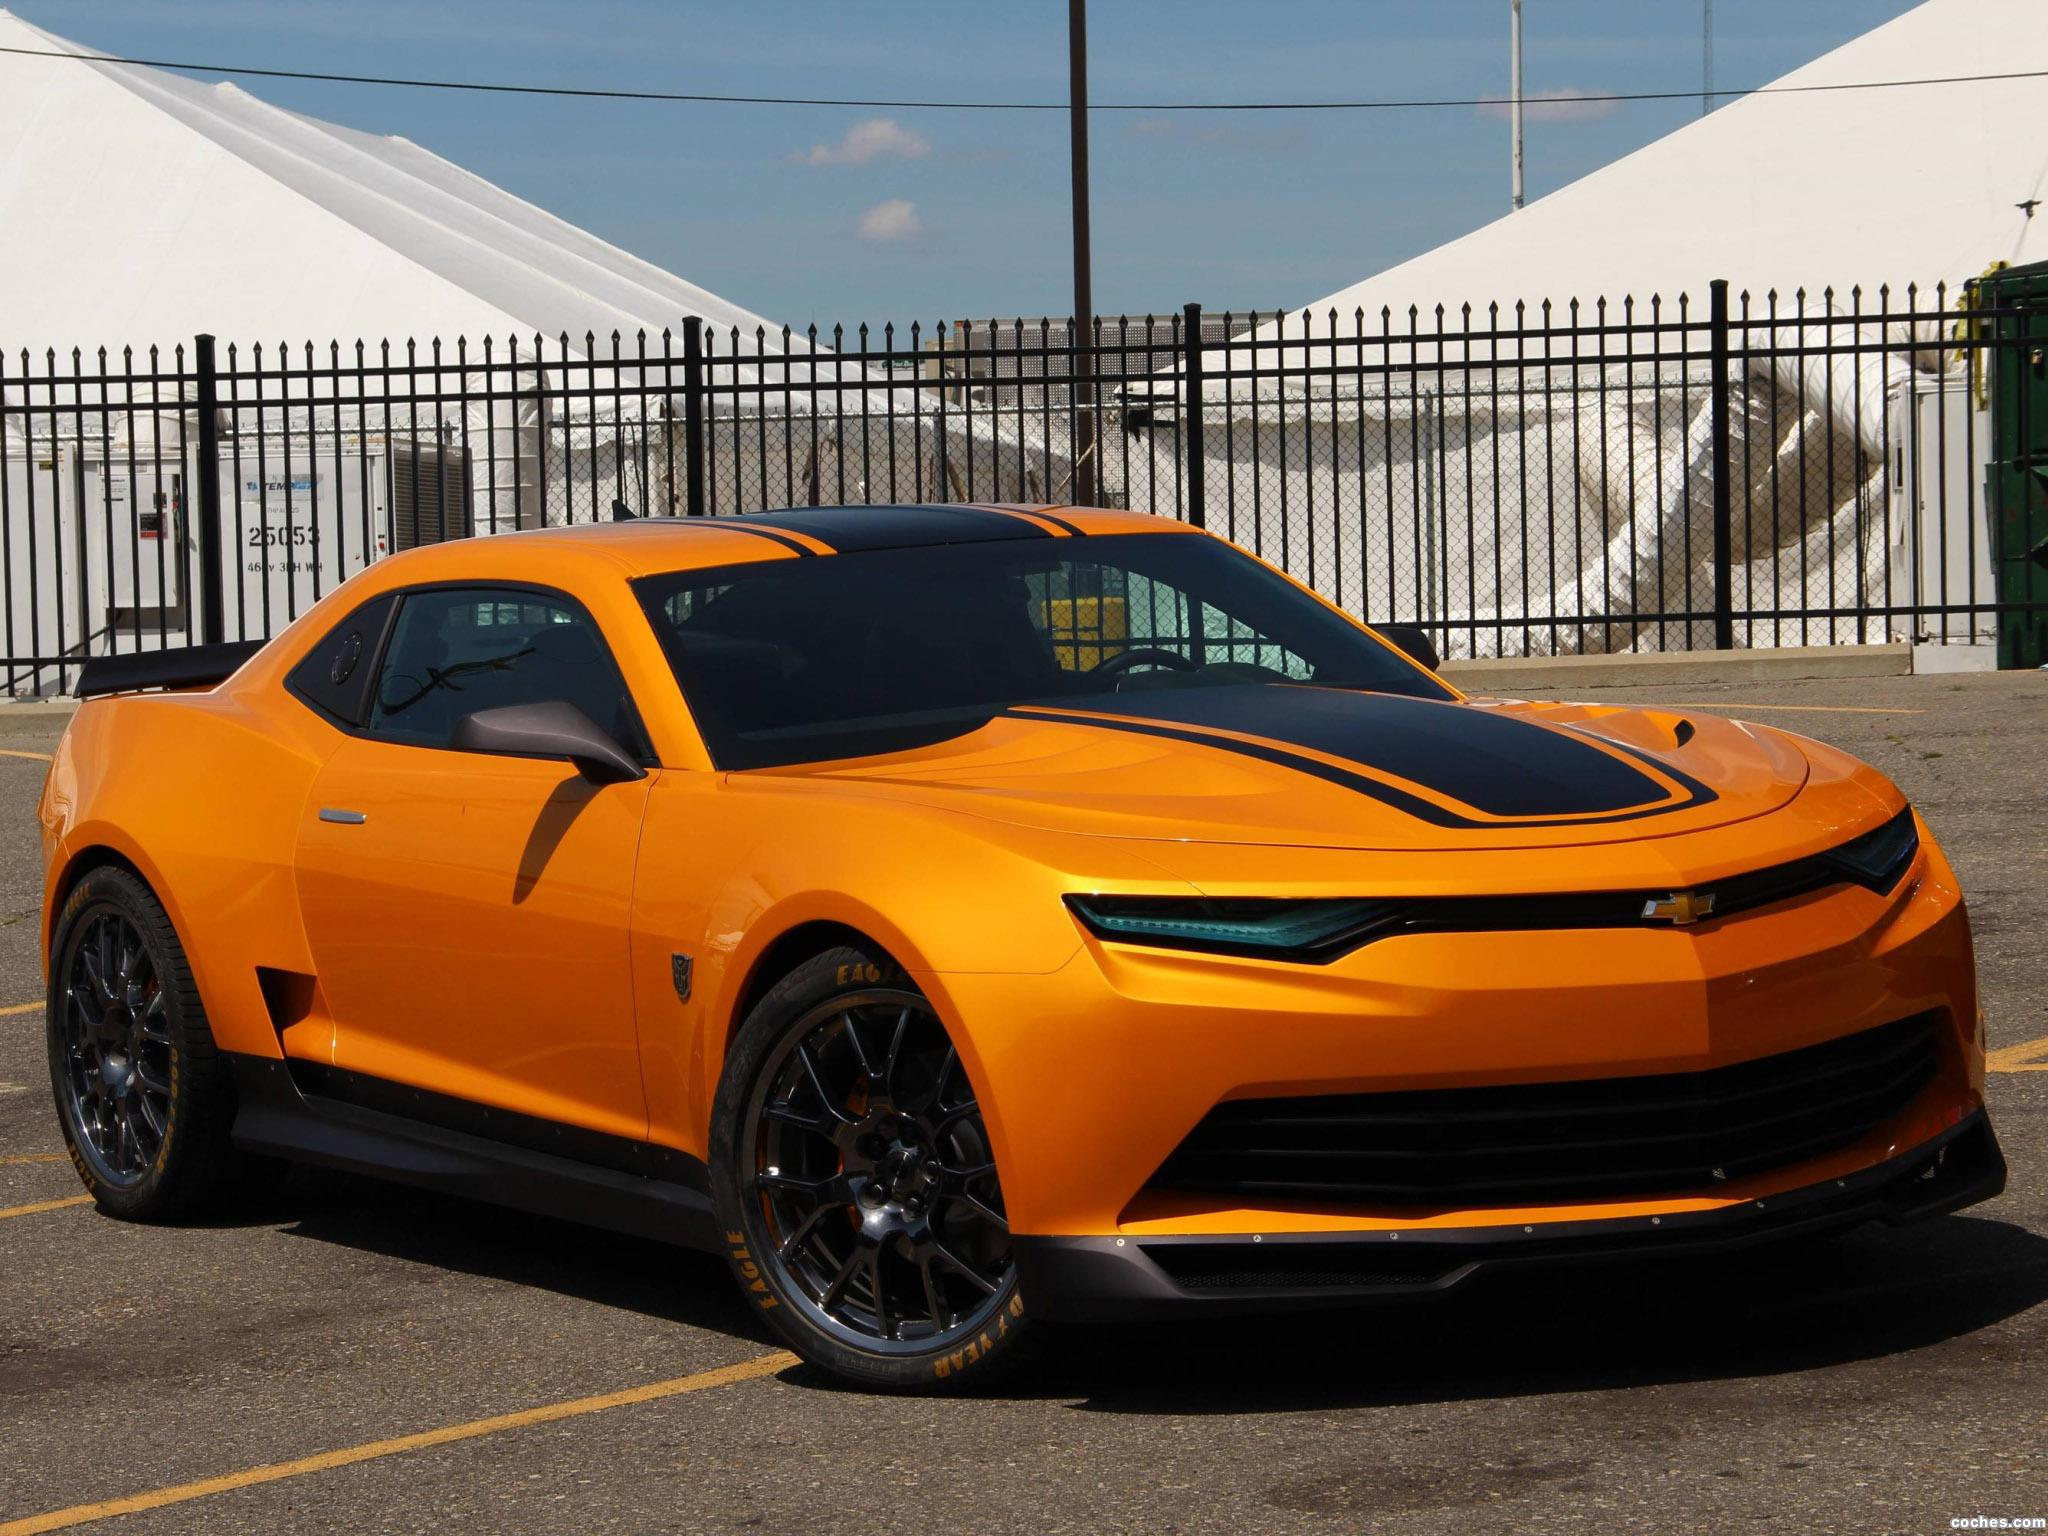 Fotos De Chevrolet Camaro Bumblebee Concept Transformers 4